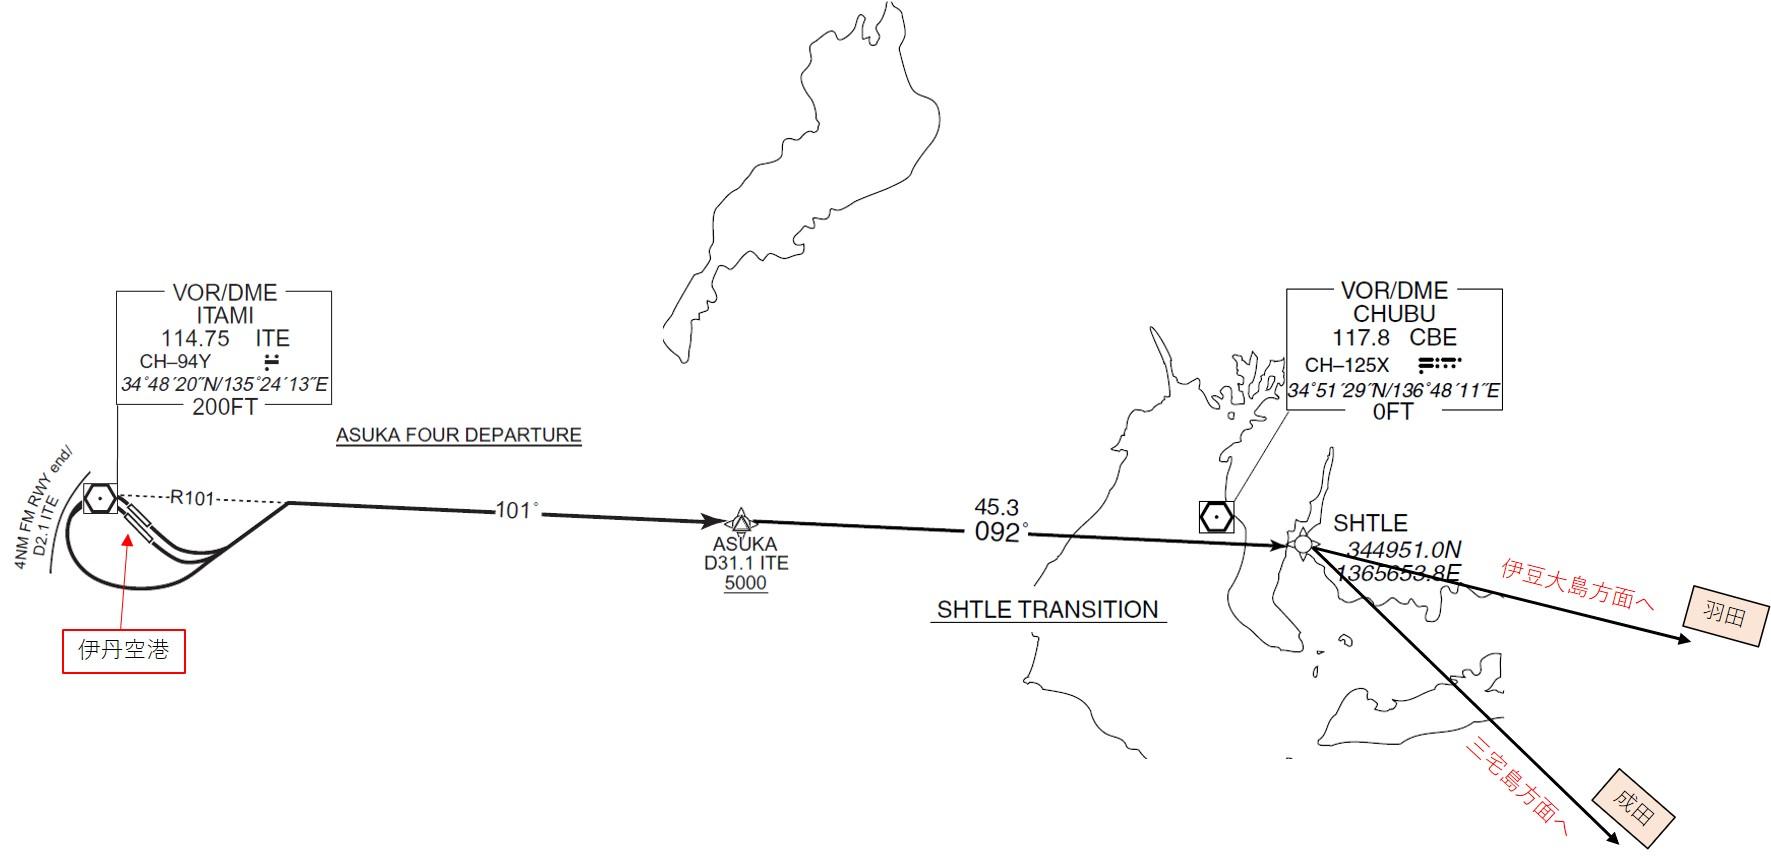 ASUKA DEPARTUREからSHTLE TRANSITIONへの飛行経路